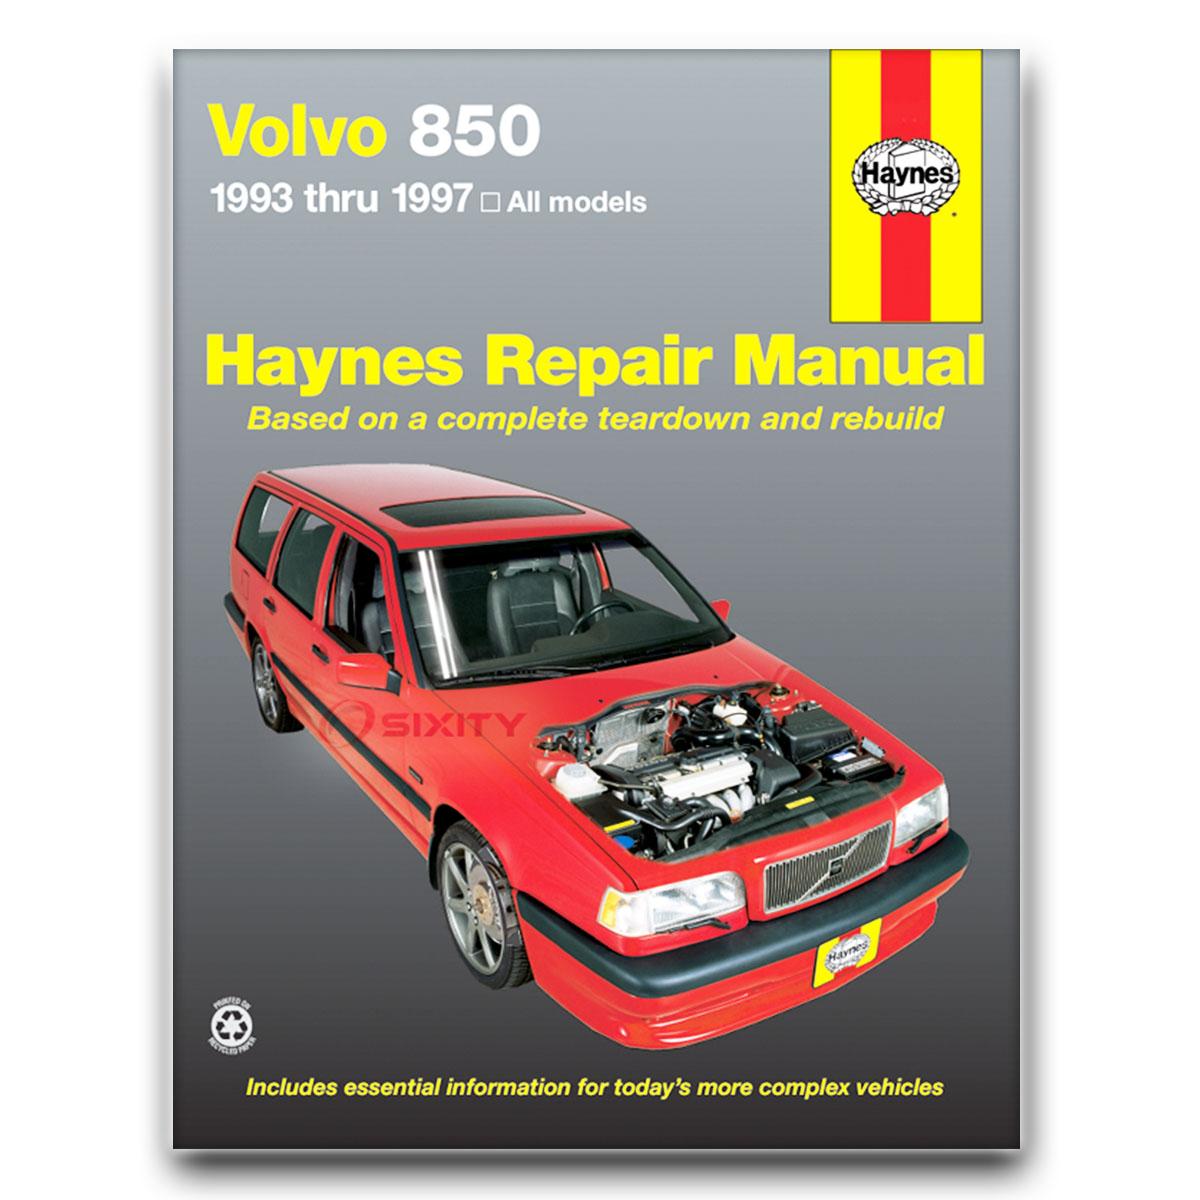 Volvo 850 Haynes Repair Manual R GLT Turbo Base T-5 T-5R Shop Service  Garage eg